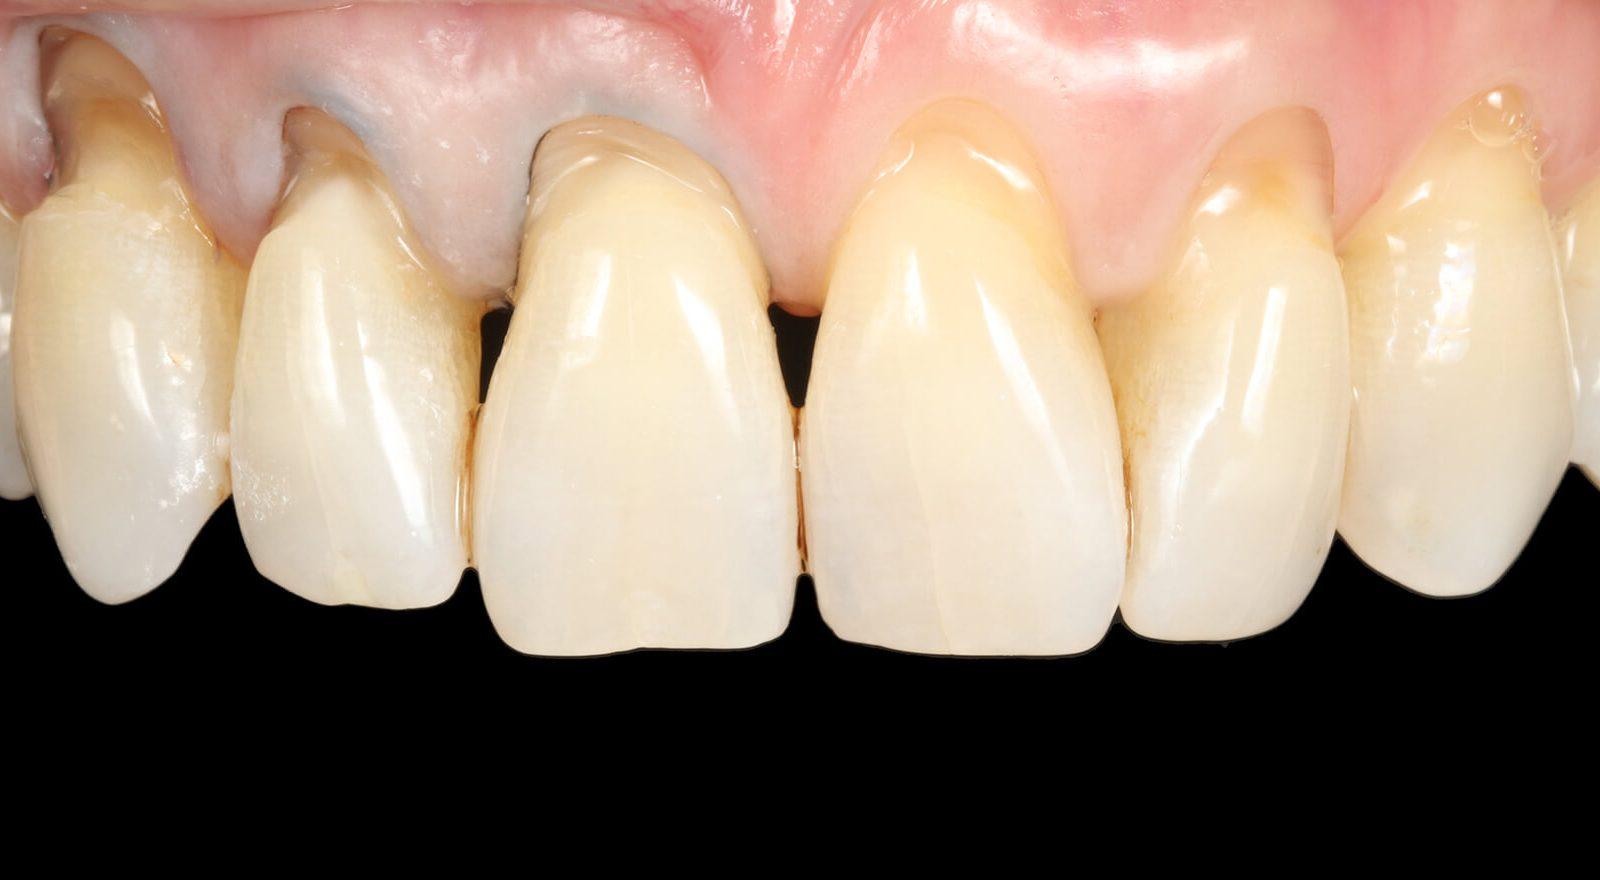 Gap Closure Bonding Composite Teeth Bonding Dental Bonding Bournemouth Poole